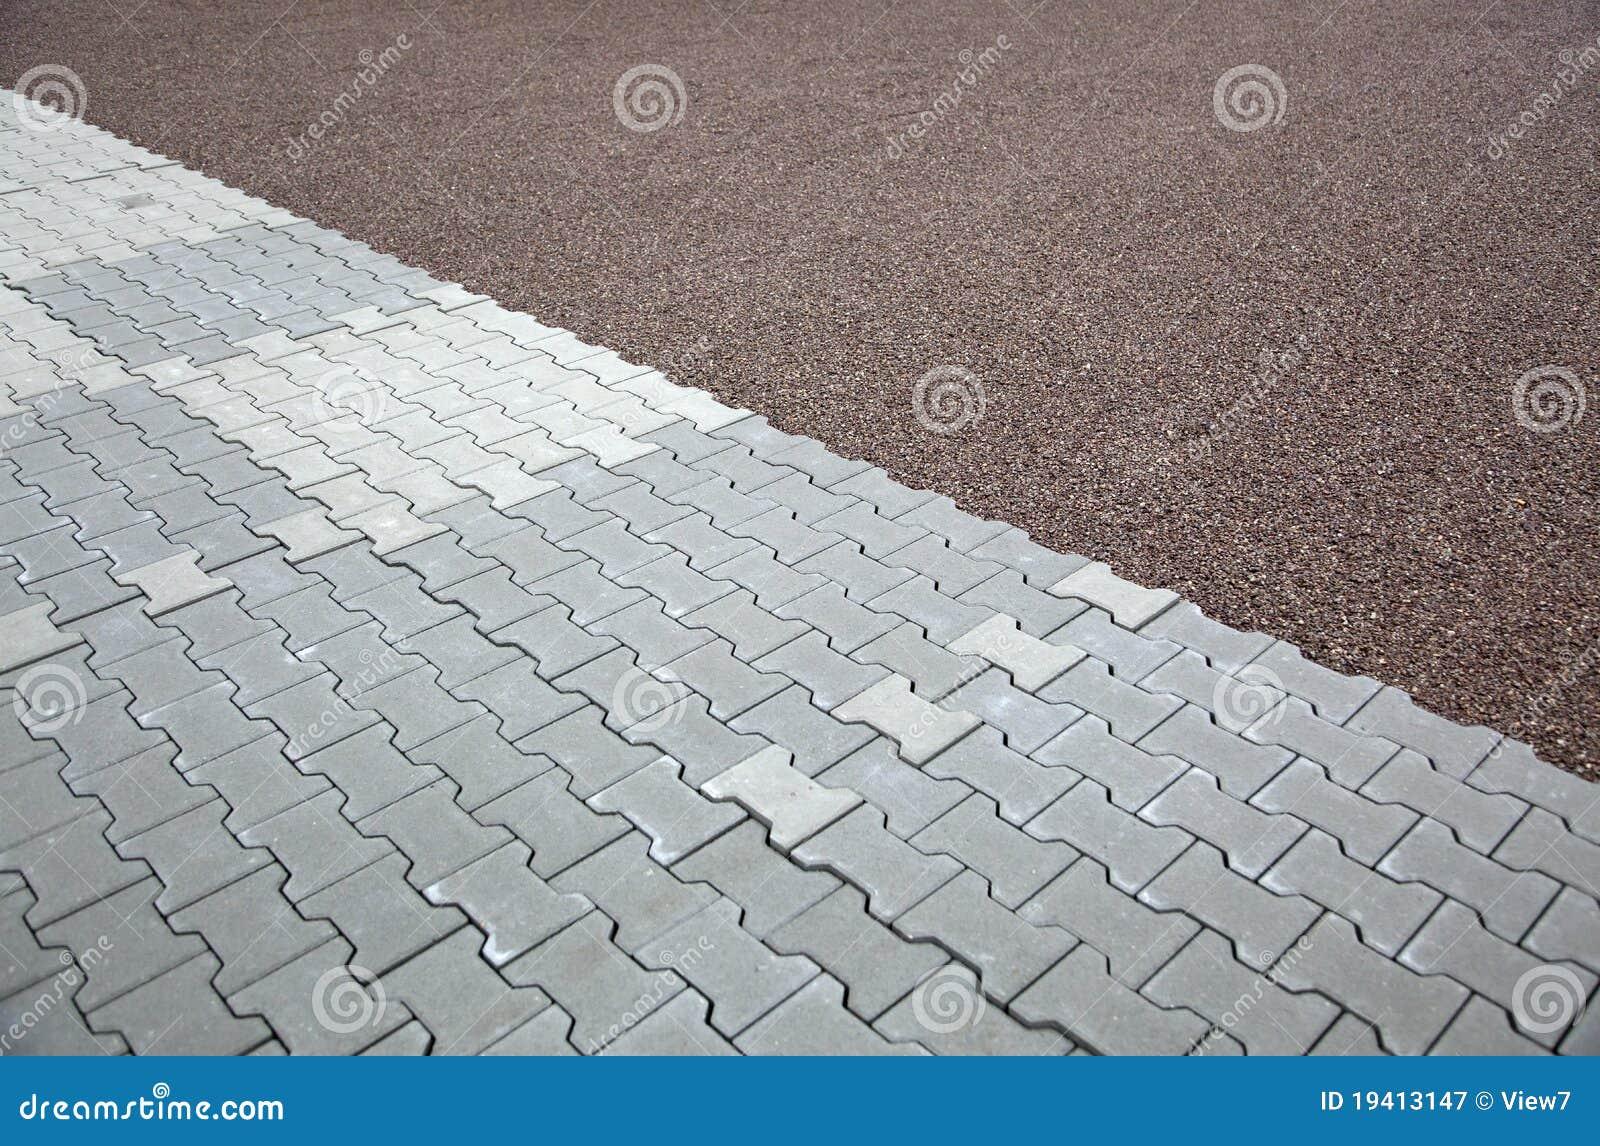 Z Brick Flooring : Interlocking brick flooring royalty free stock photography